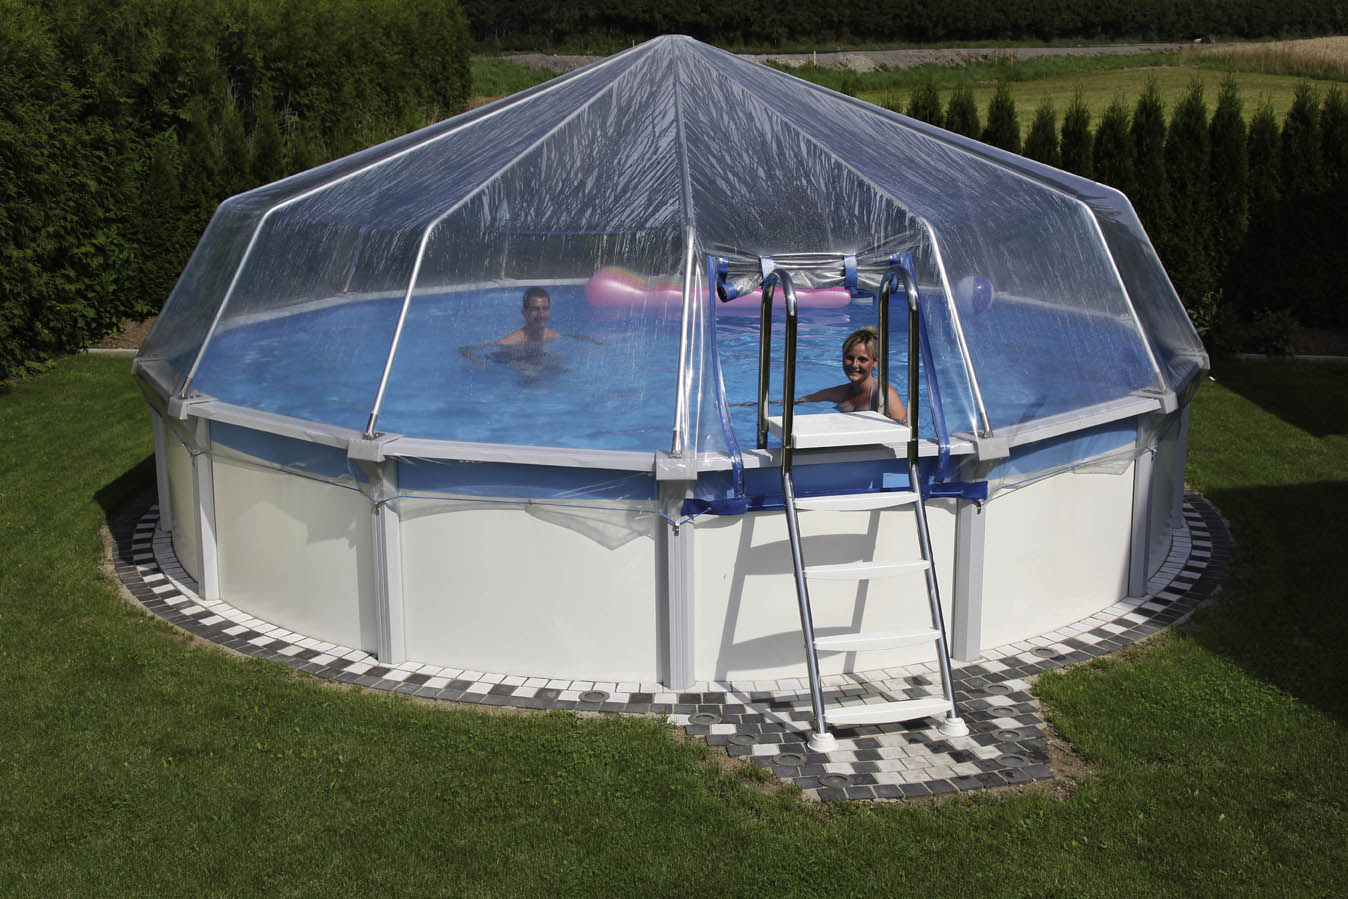 stahlwand schwimmbecken sun remo mit sonnendom cranpool. Black Bedroom Furniture Sets. Home Design Ideas